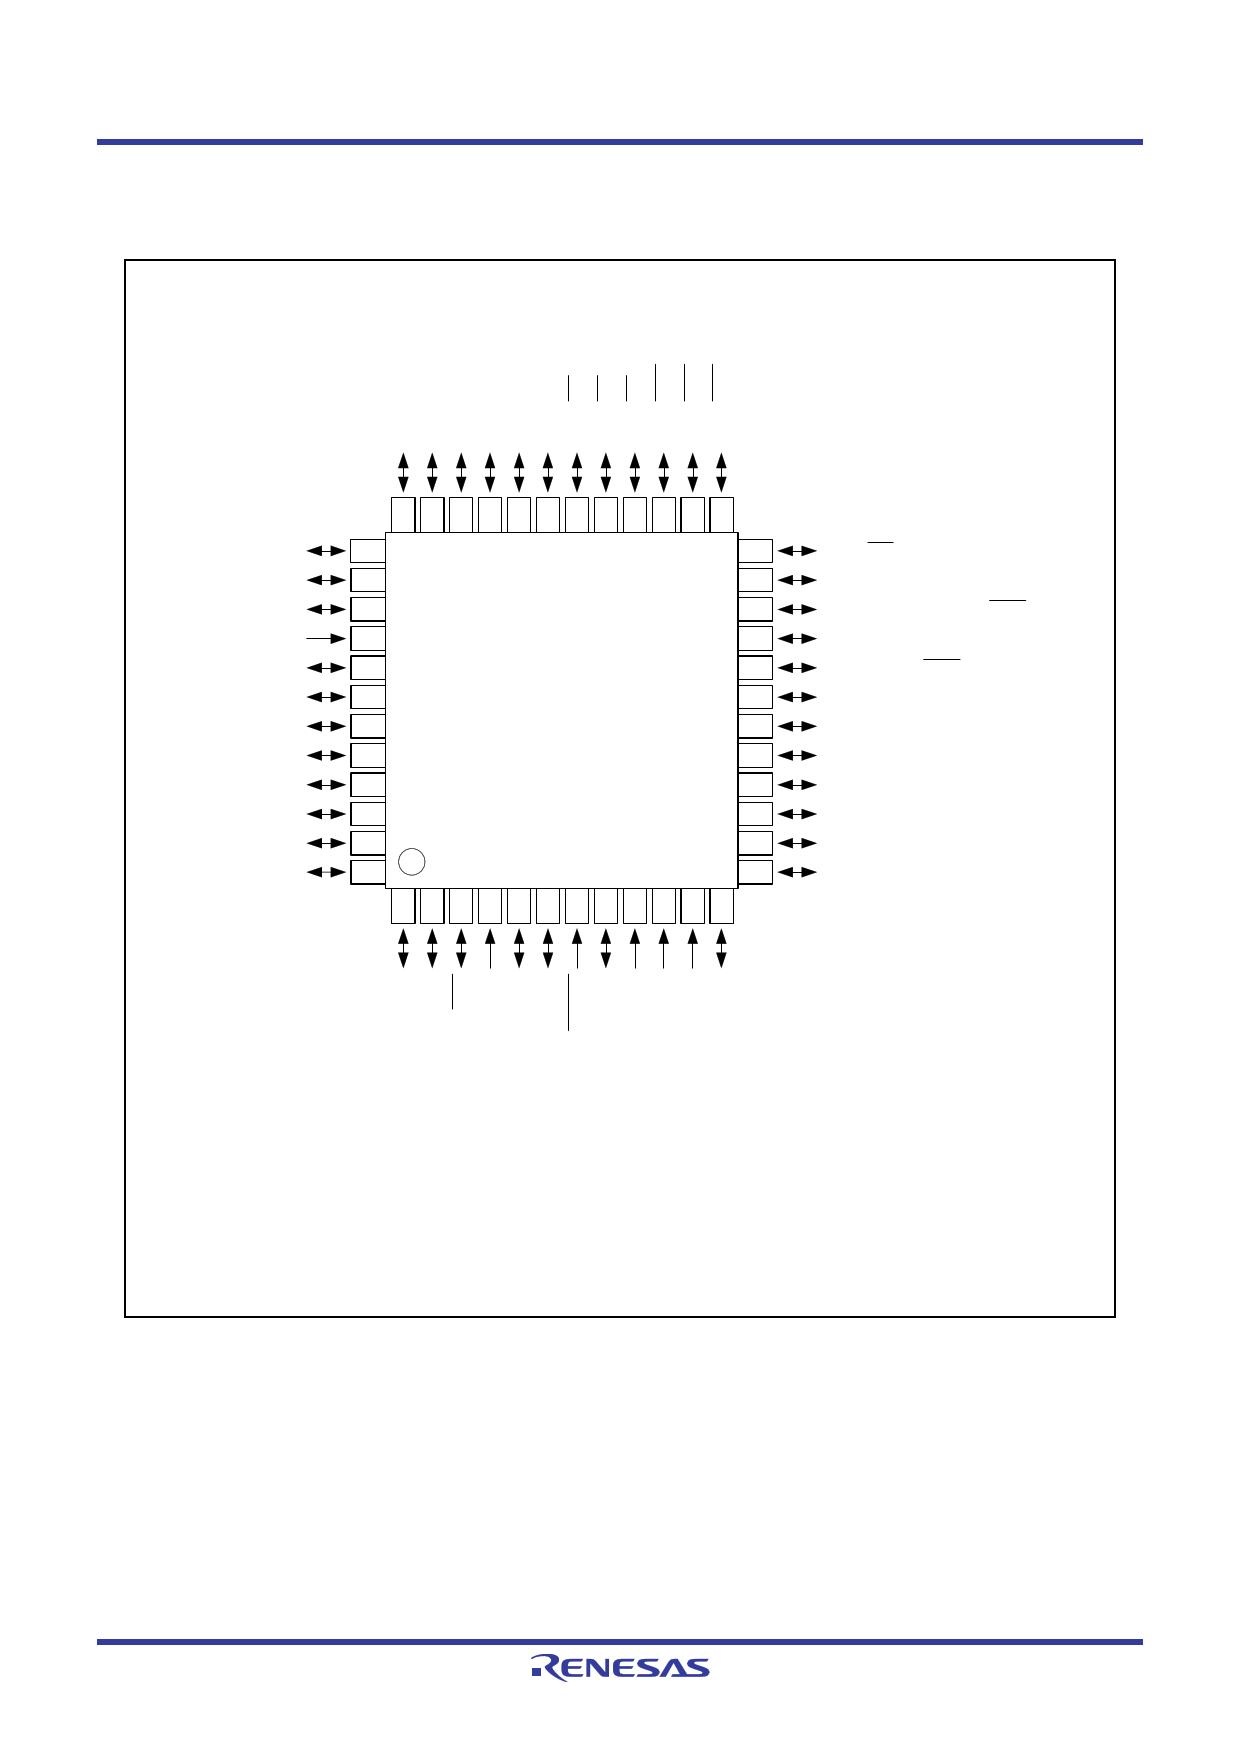 R5F2122CJFP 전자부품, 판매, 대치품